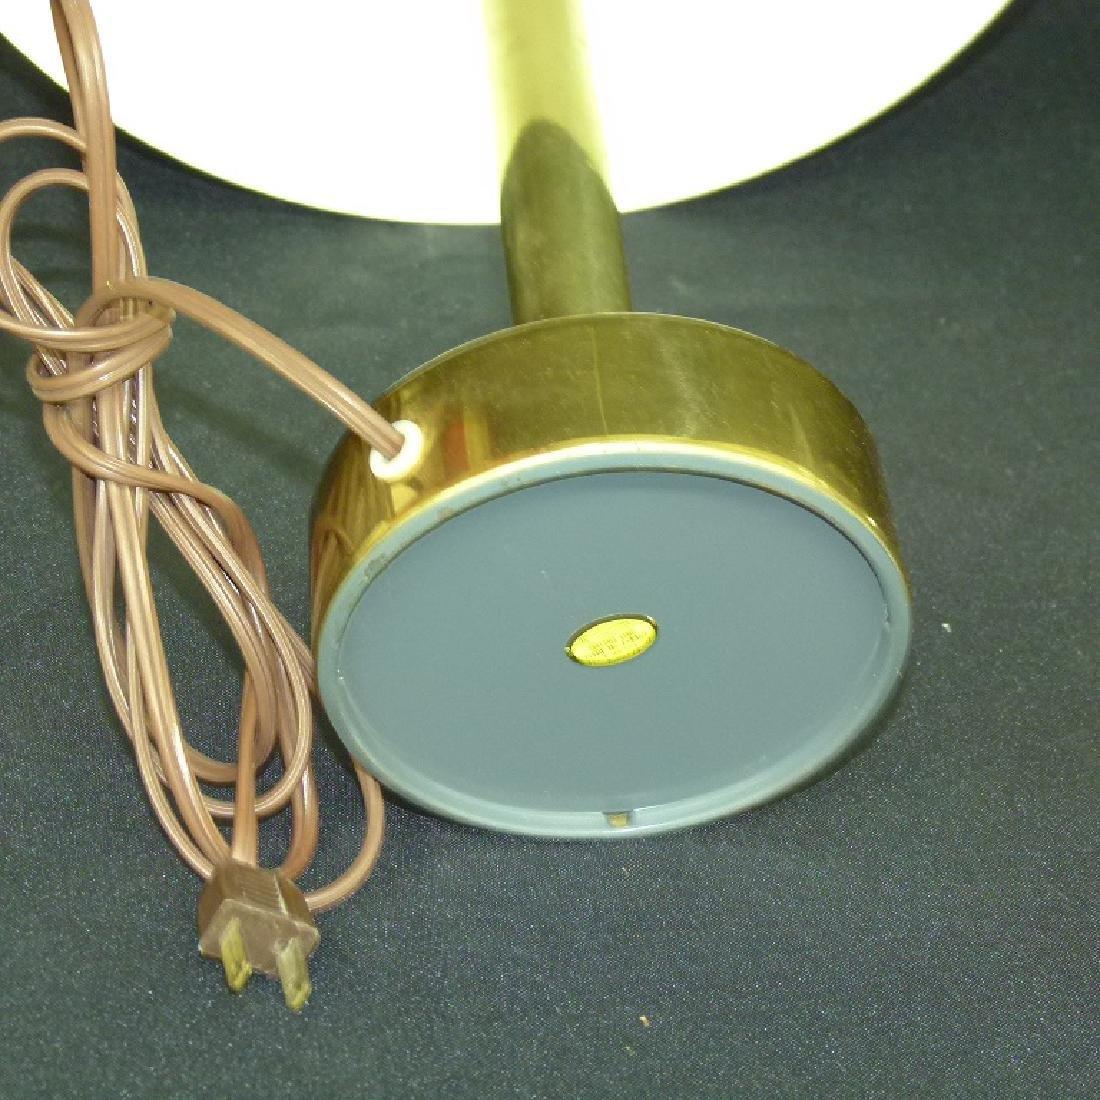 MID CENTURY MODERN BRASS MUSHROOM TABLE LAMP, C. 1960 - 5